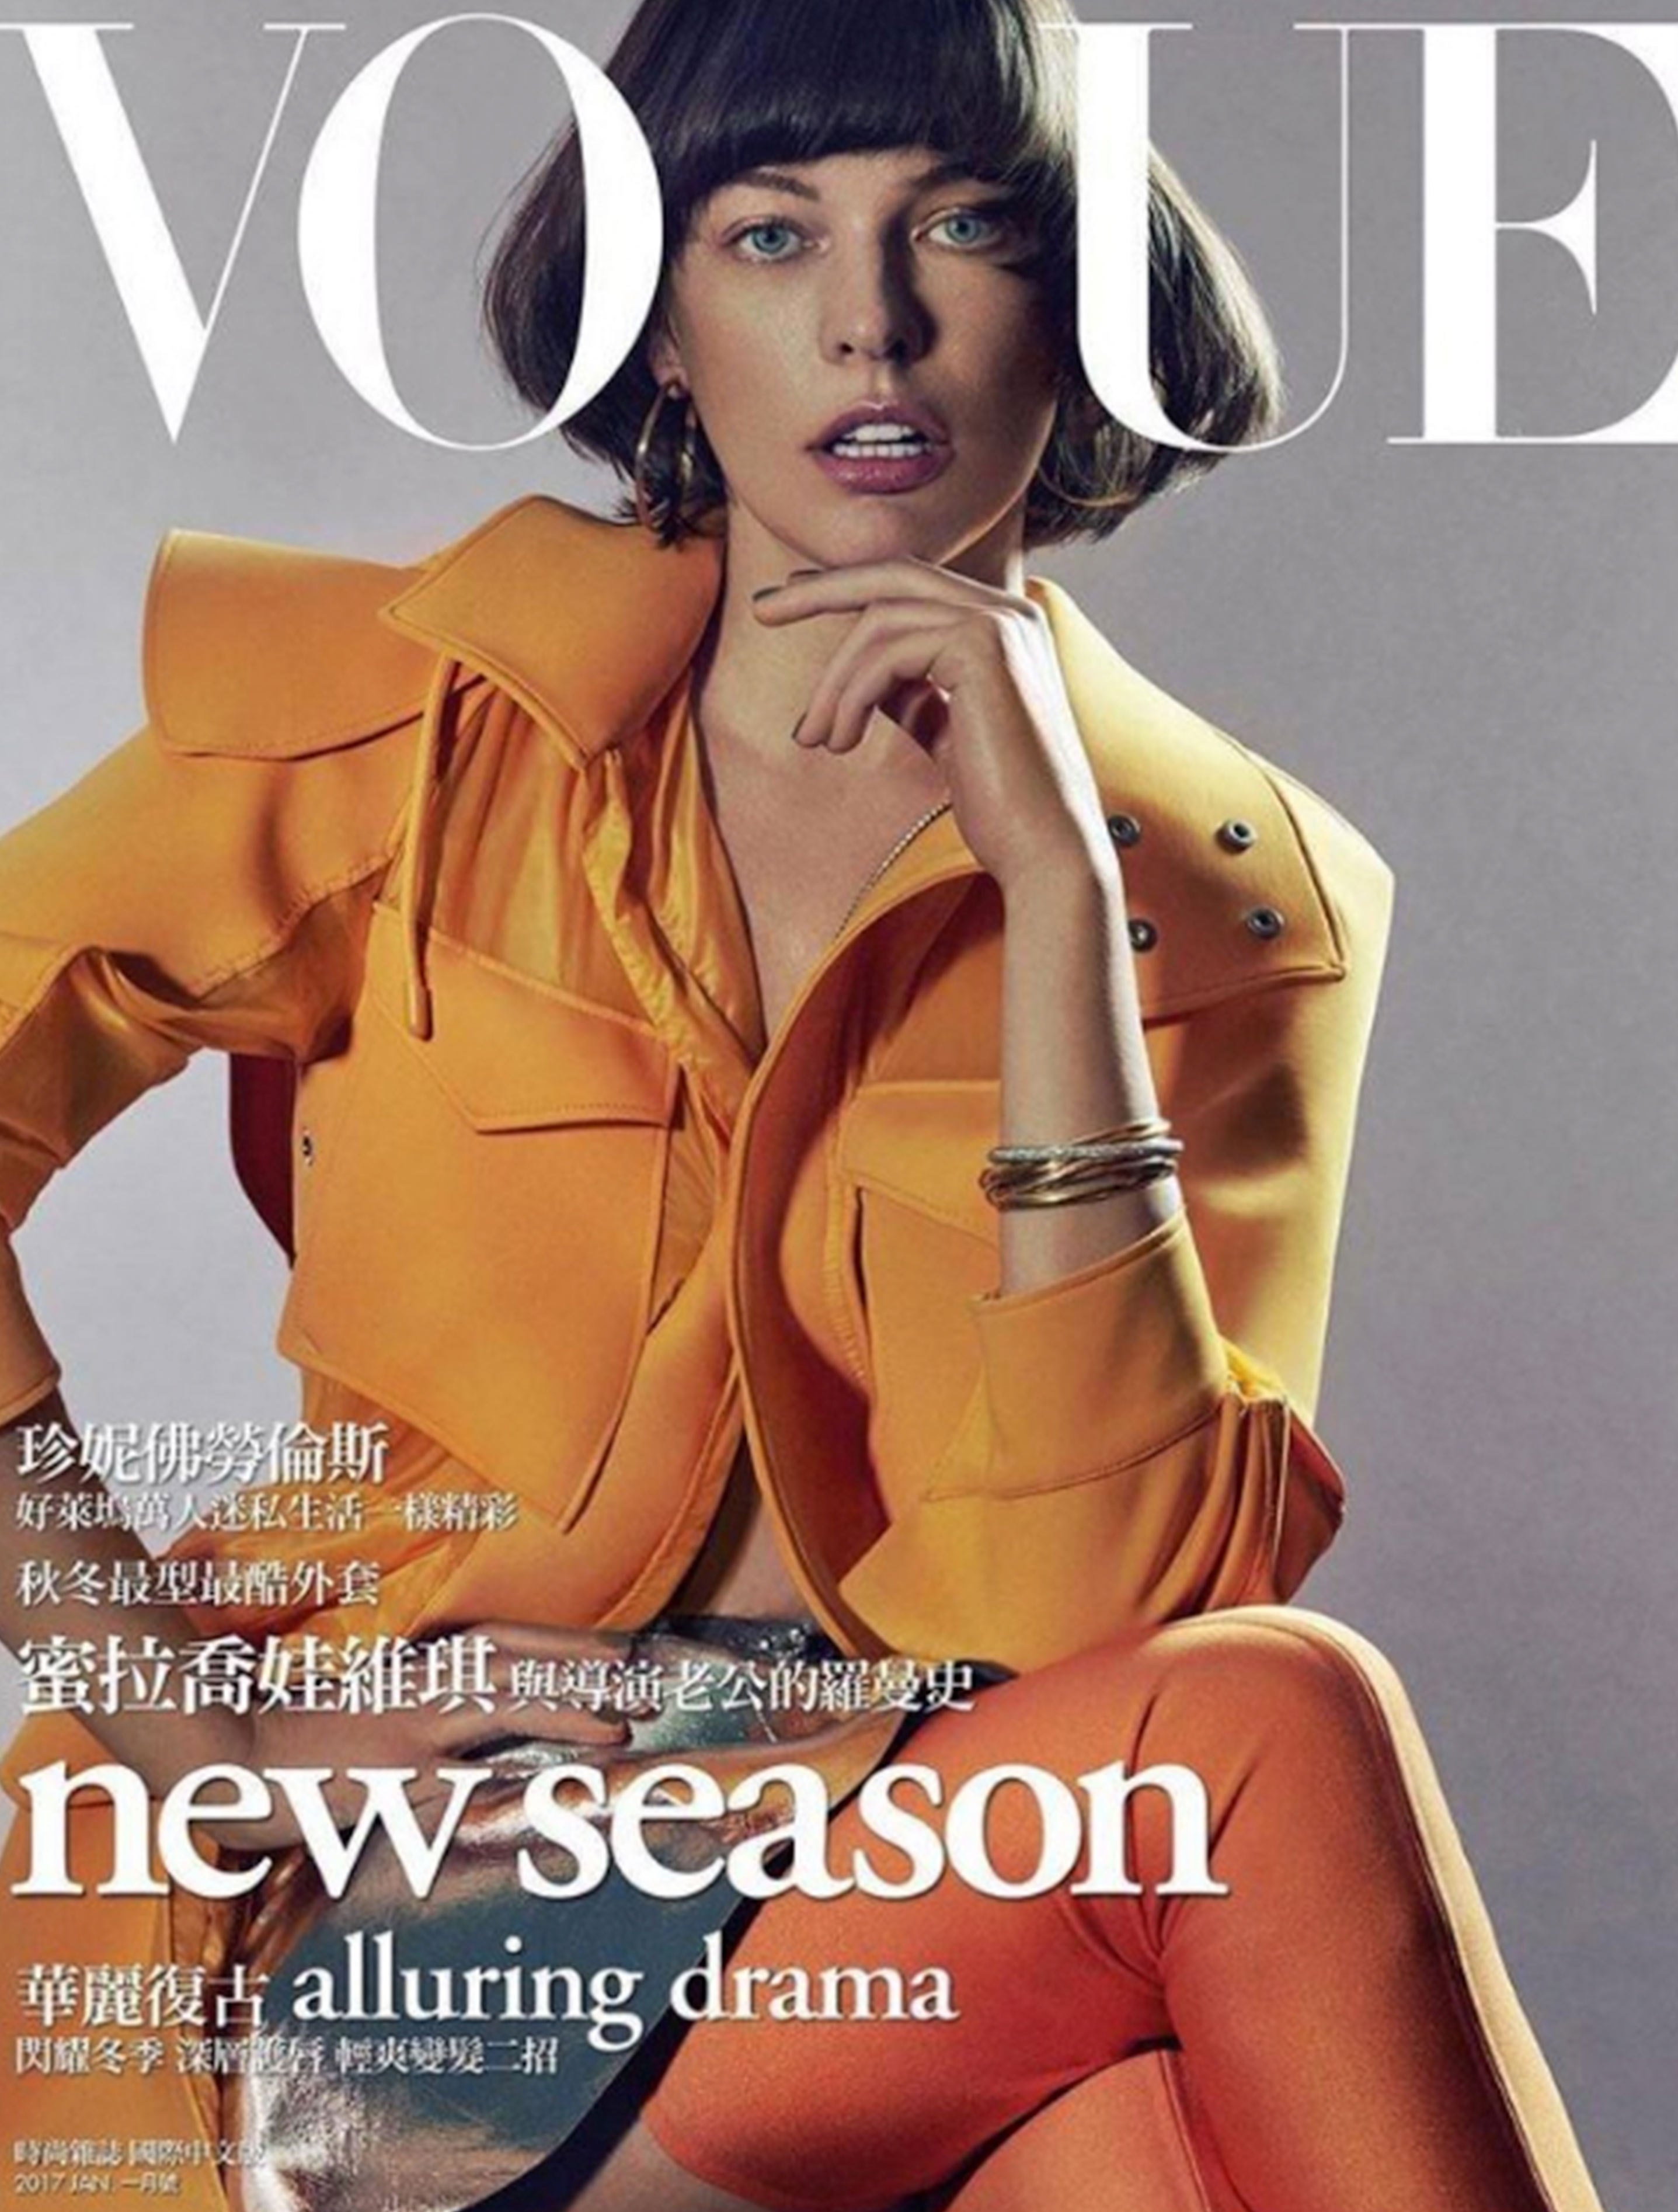 Vogue Taiwan, January 2017